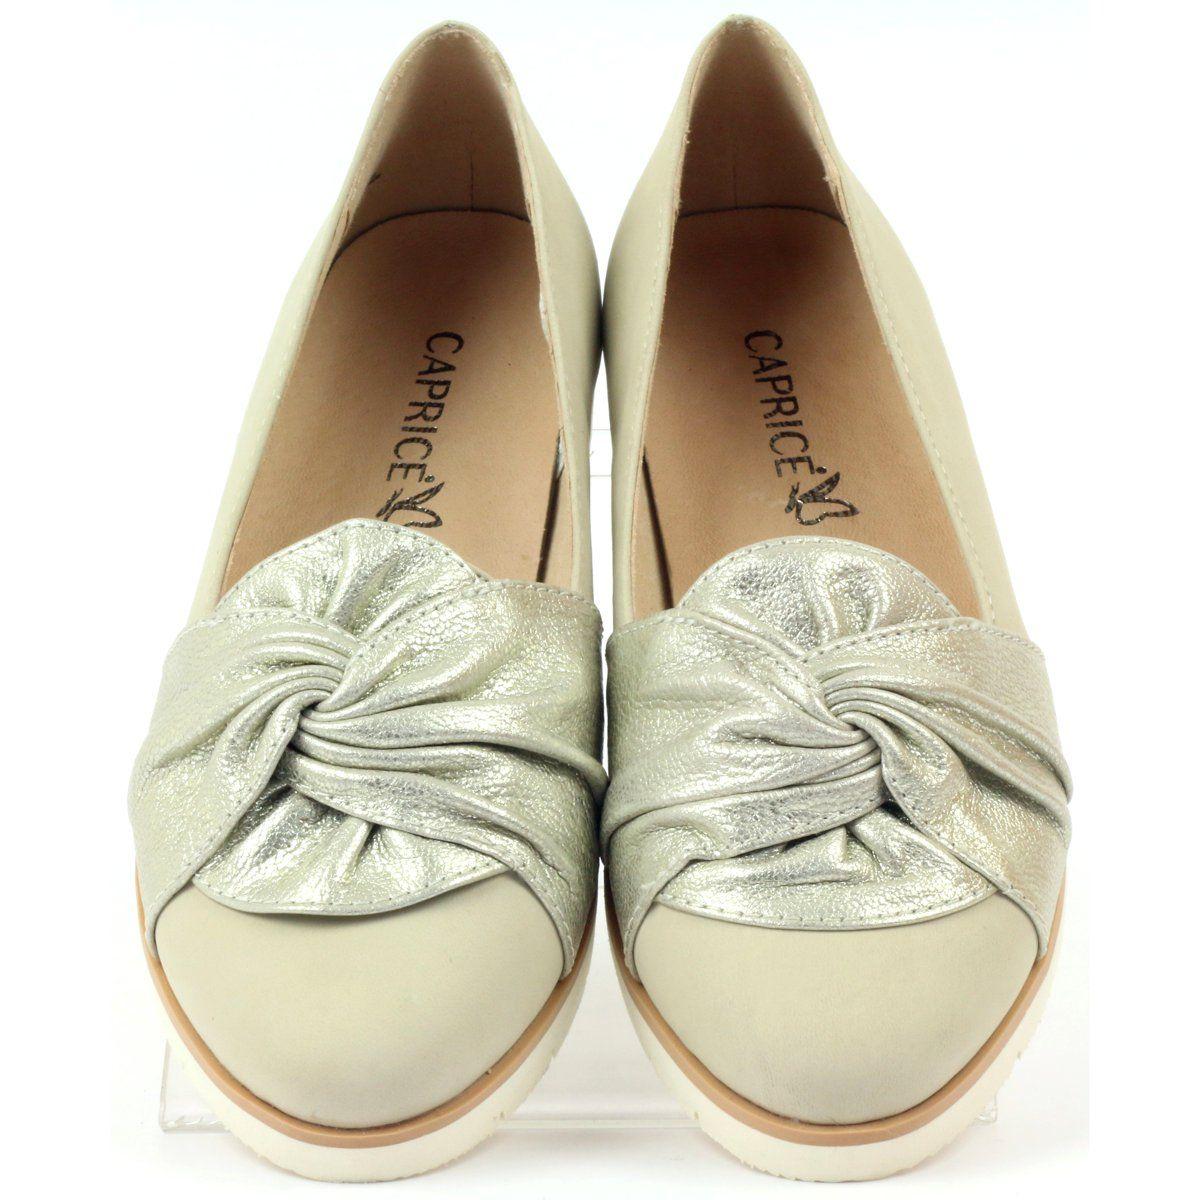 Caprice Czolenka Polbuty Buty Damskie 24607 Bezowy Zloty Women Shoes Shoes Pump Shoes